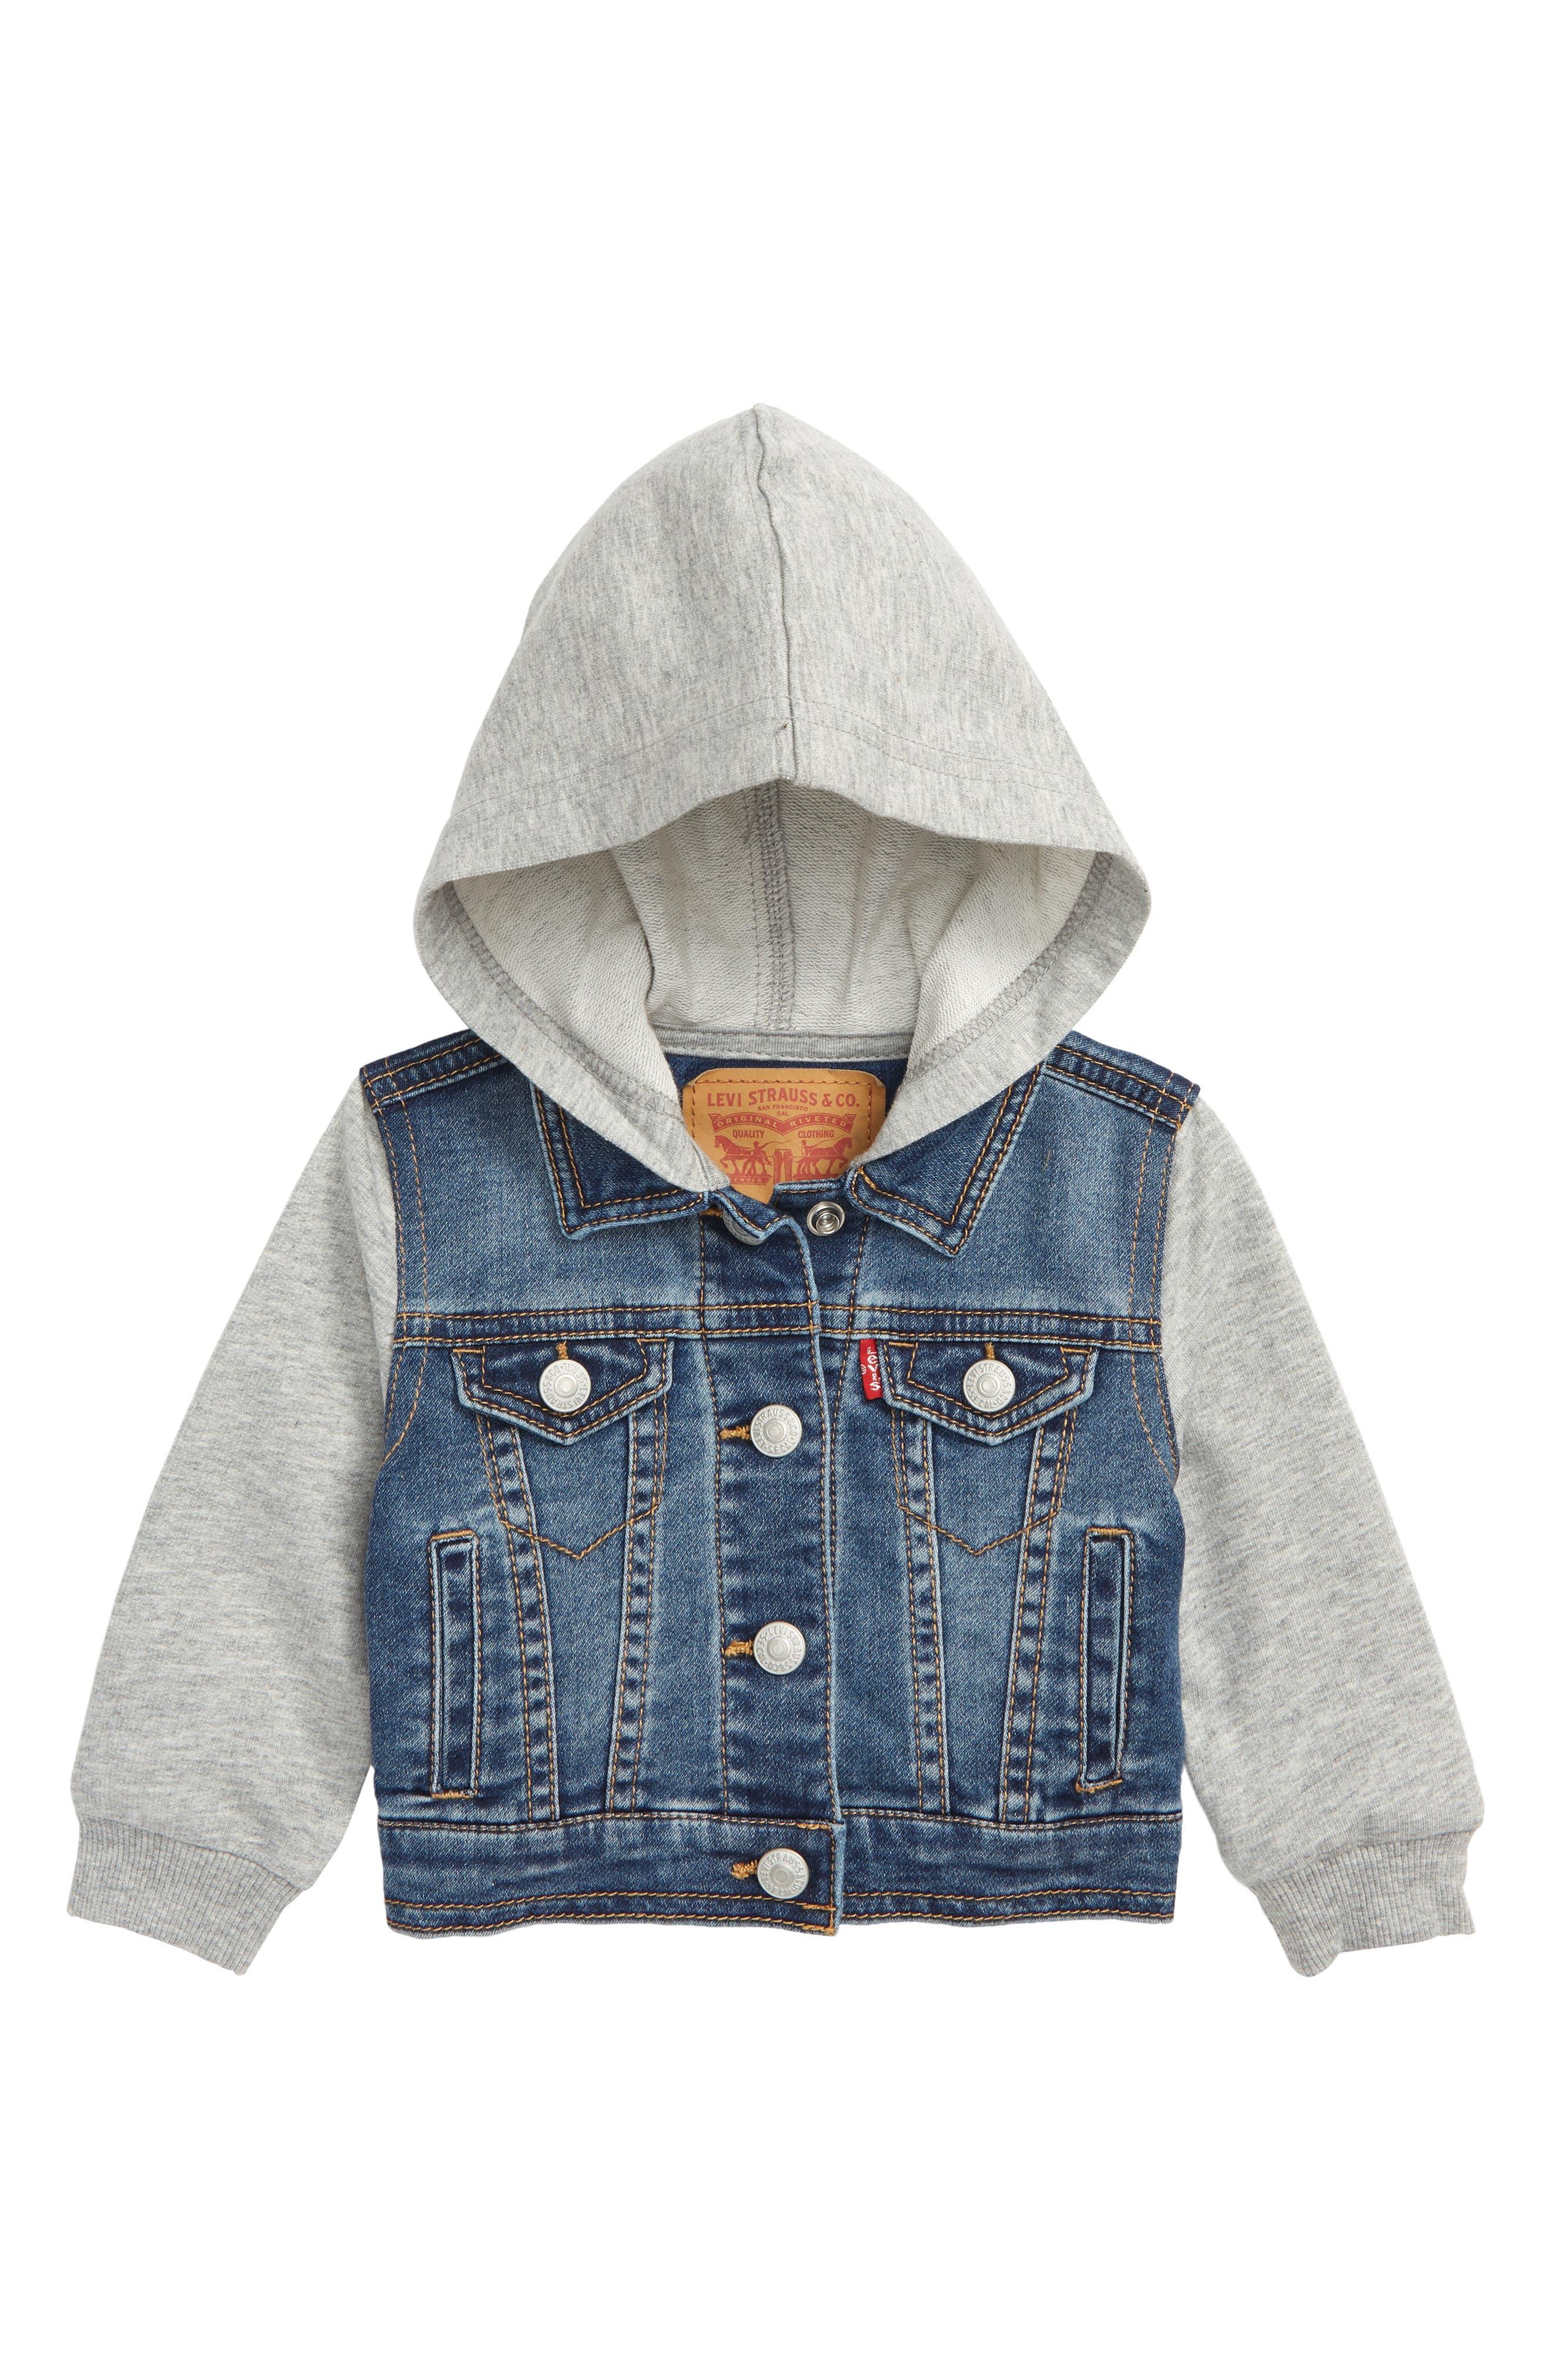 Levi's<sup>®</sup> Indigo Hooded Trucker Jacket,                             Main thumbnail 1, color,                             452